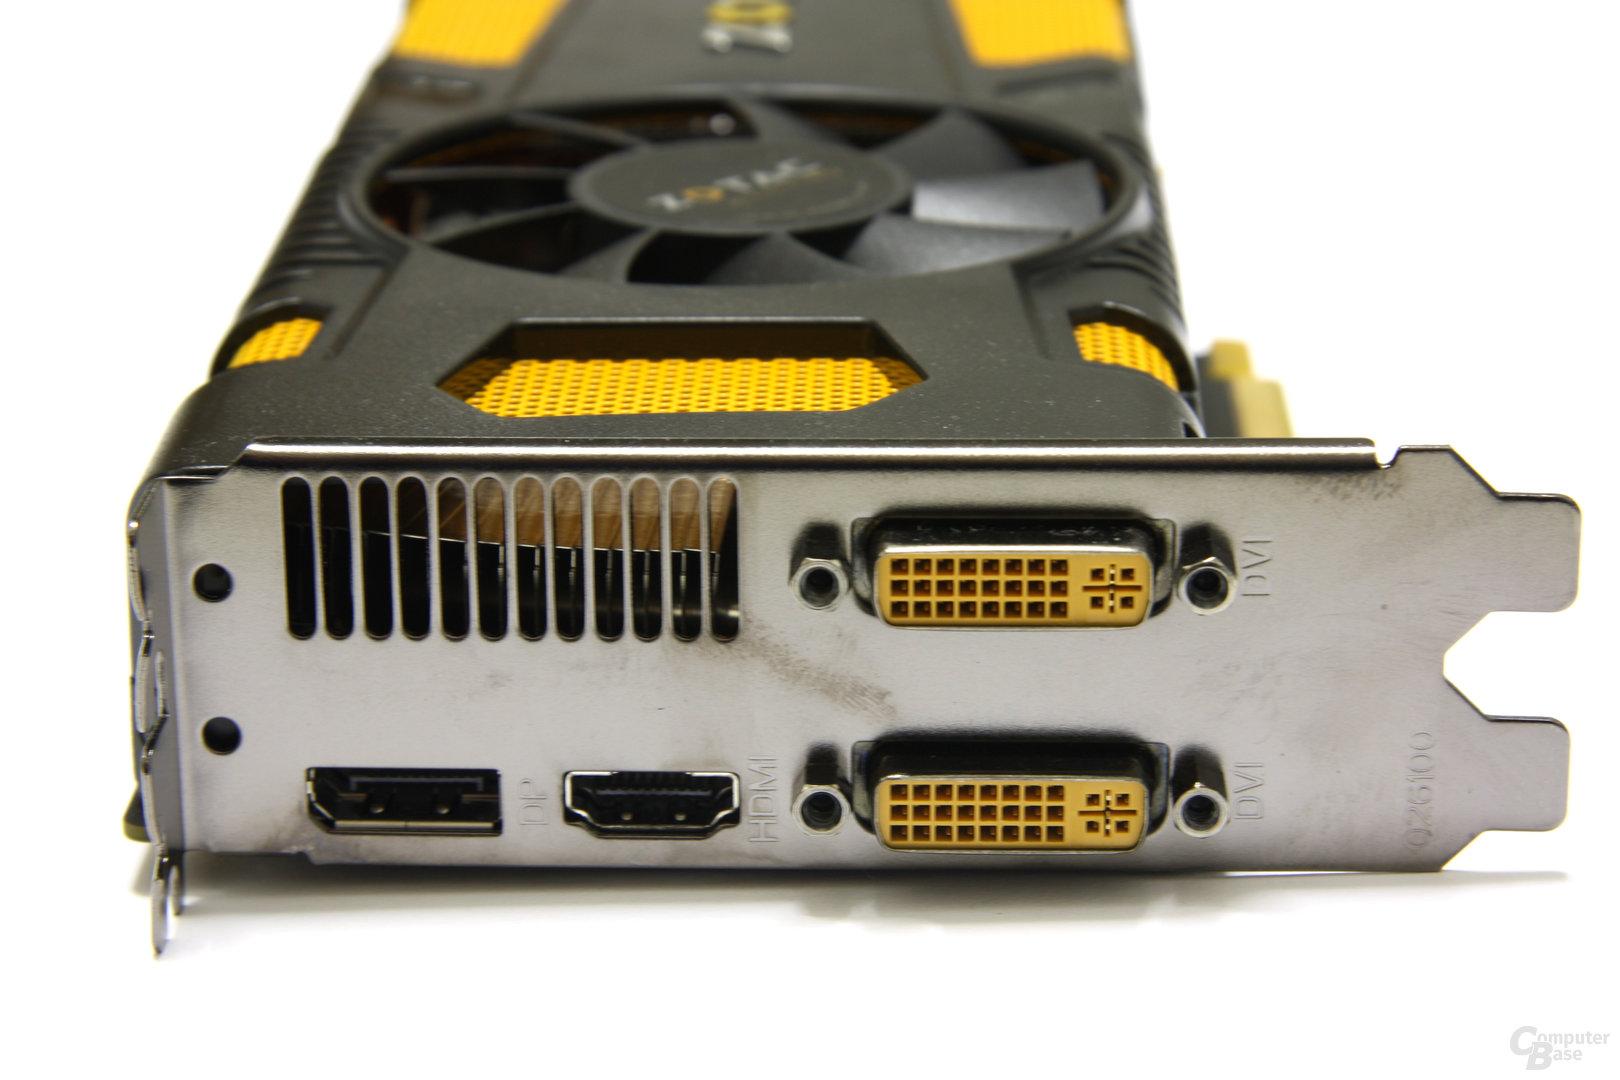 GeForce GTX 560 Ti 448 Core LE Slotblech